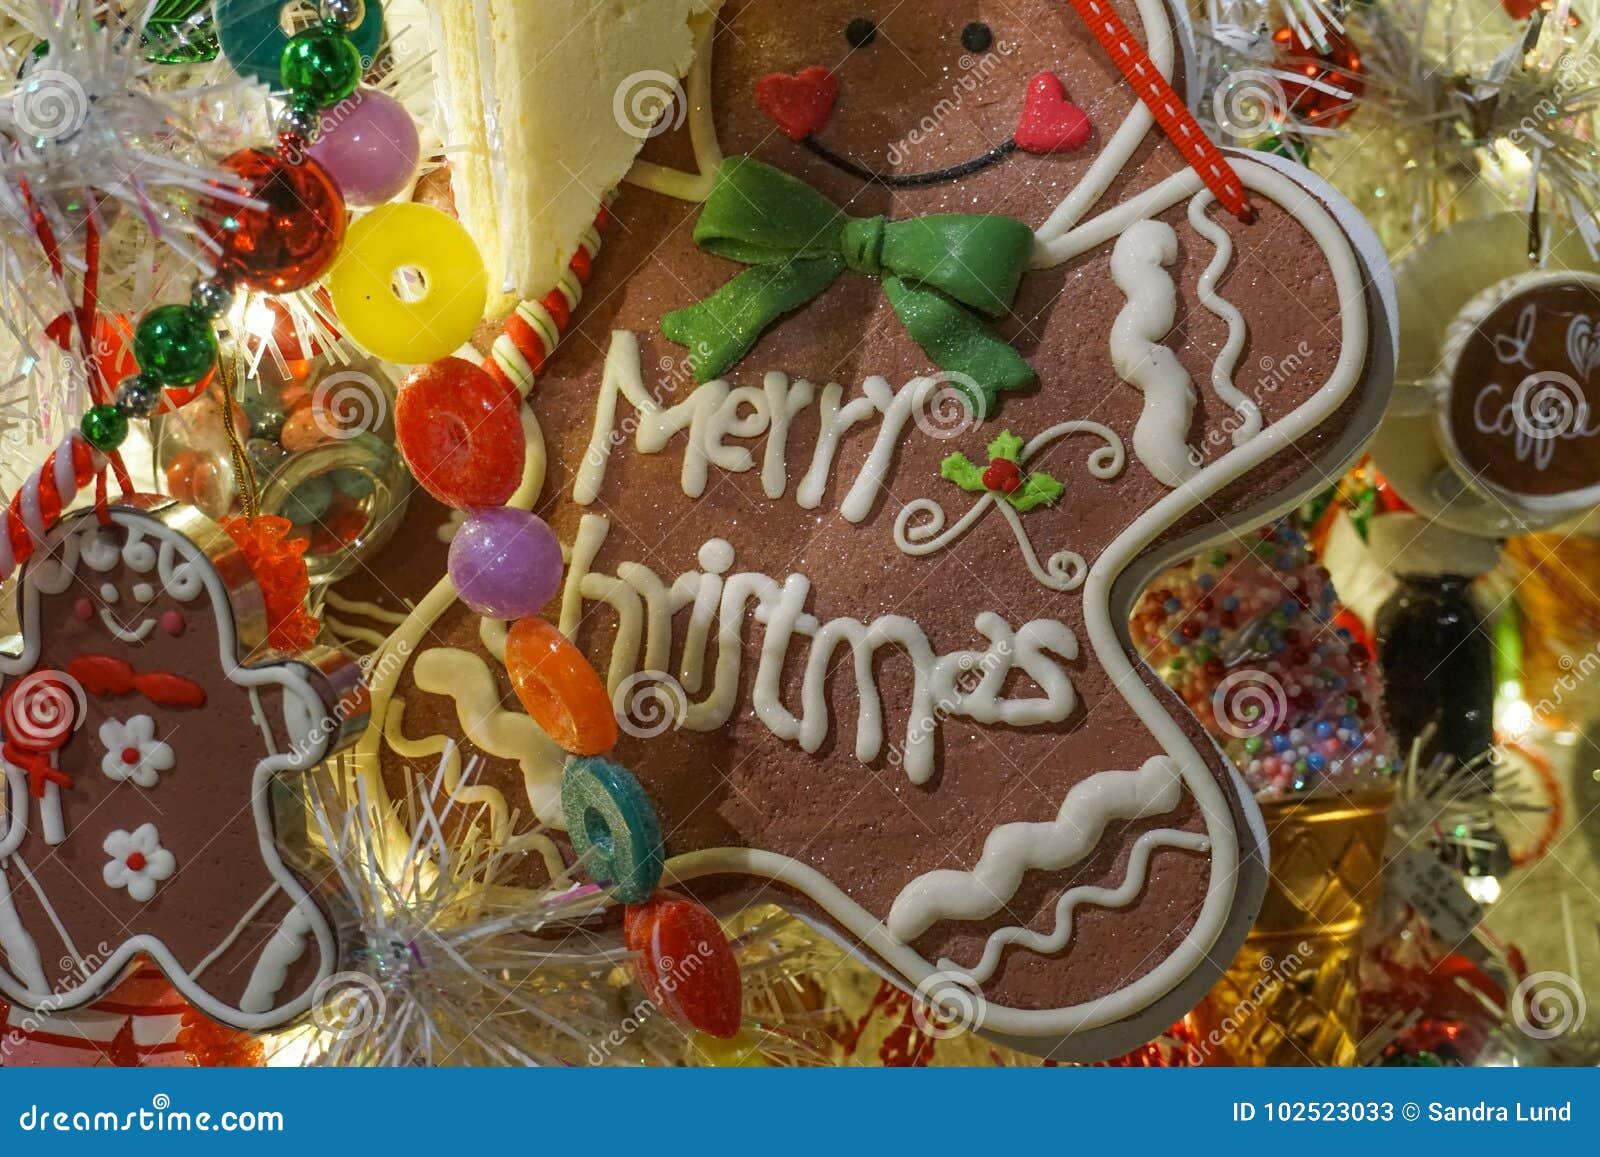 Sweet Treats Christmas Tree Decorations Stock Image